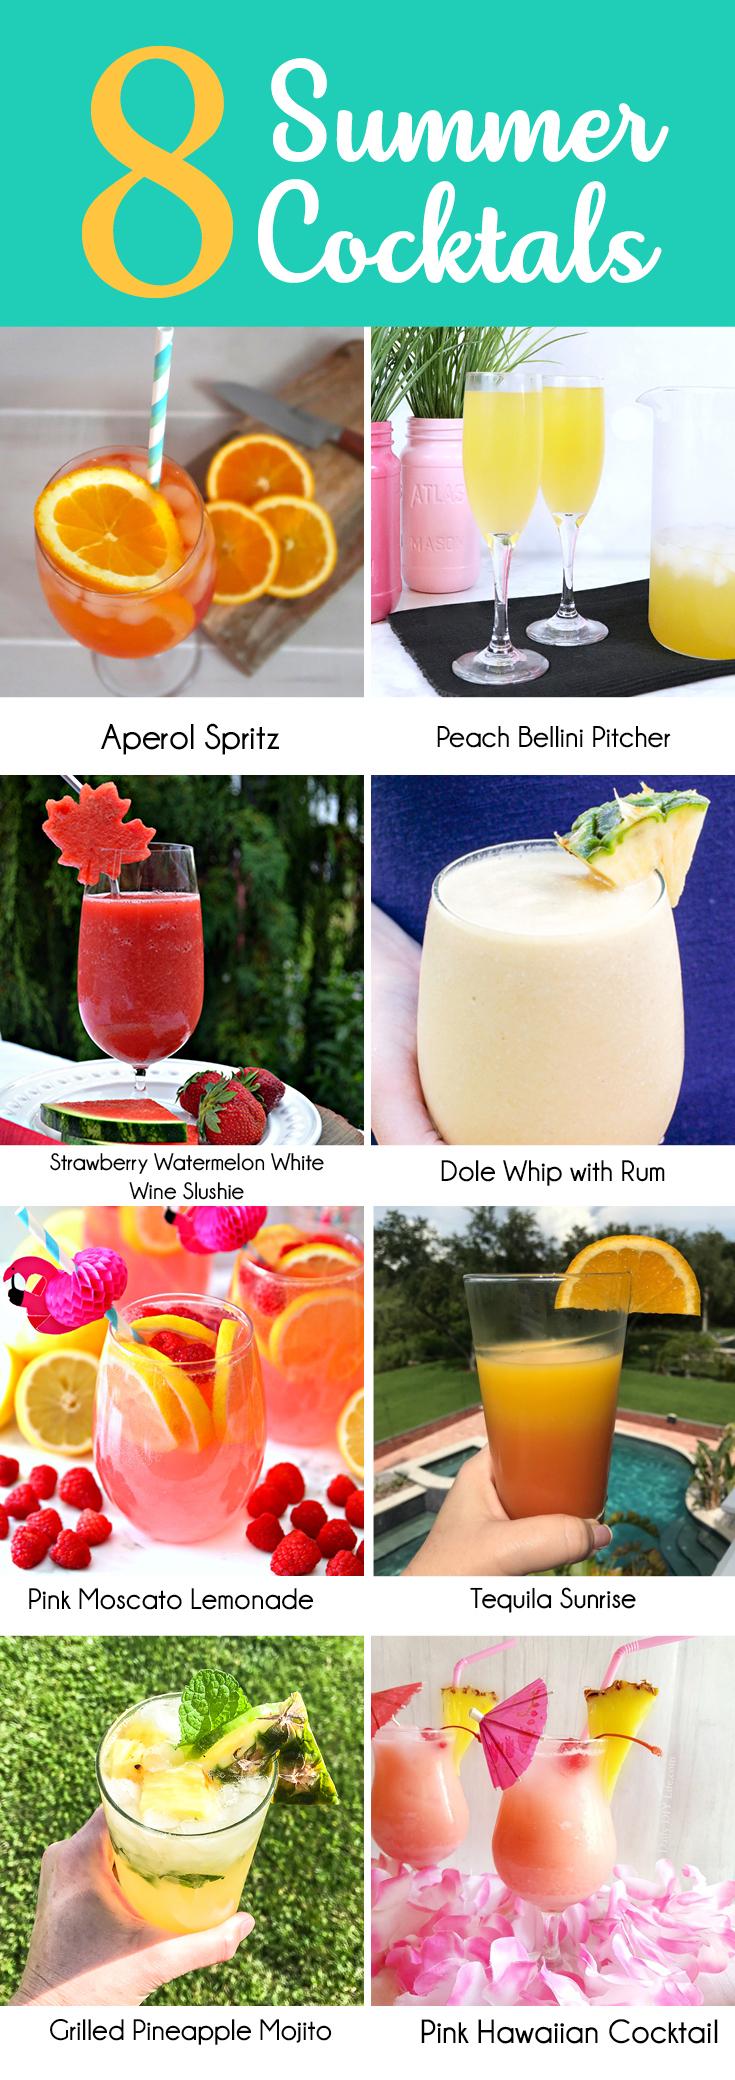 8 Summer Cocktails.jpg